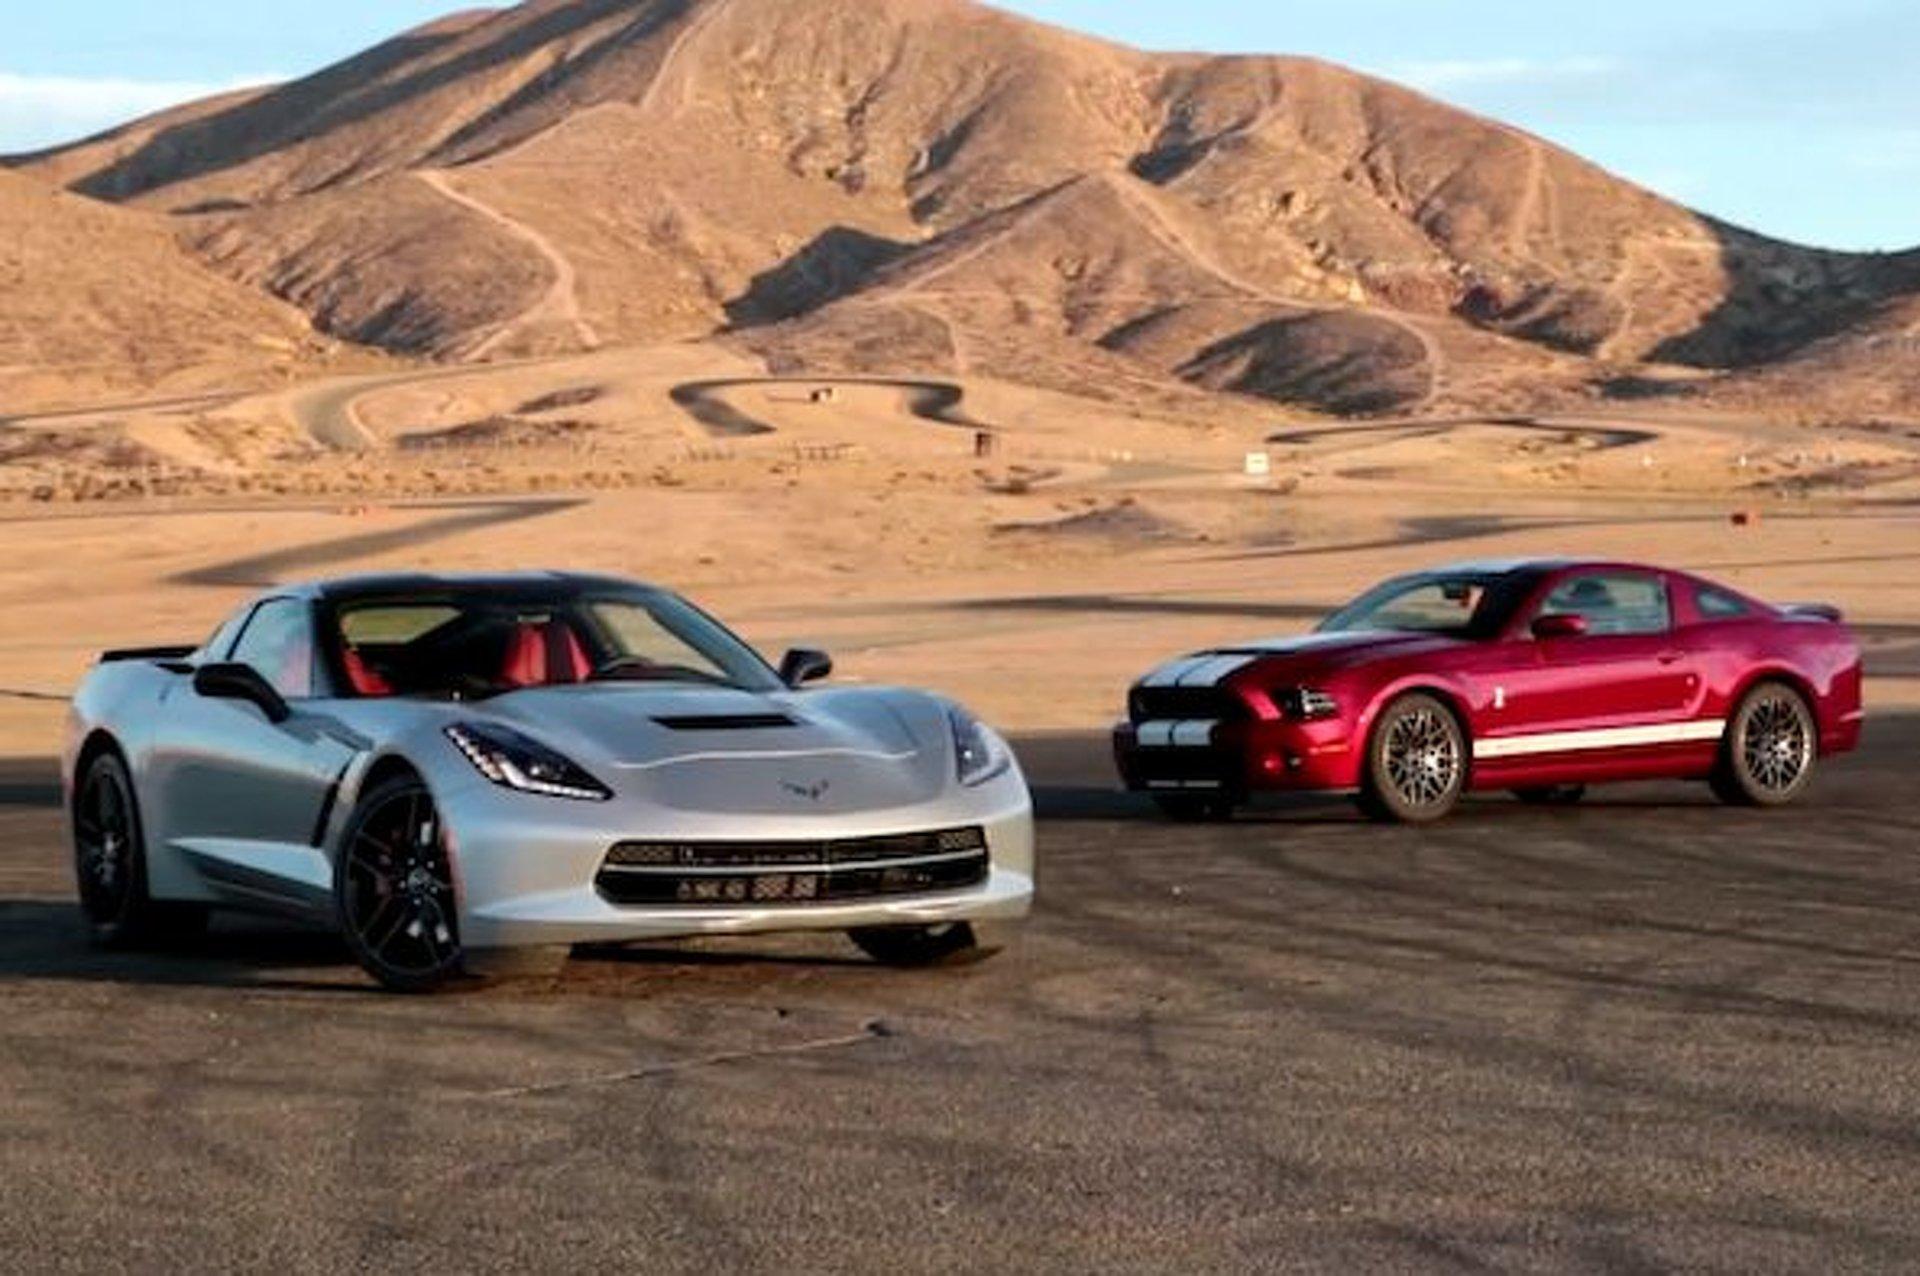 Corvette Stingray vs Shelby GT500 in the Ultimate Track Battle [video]